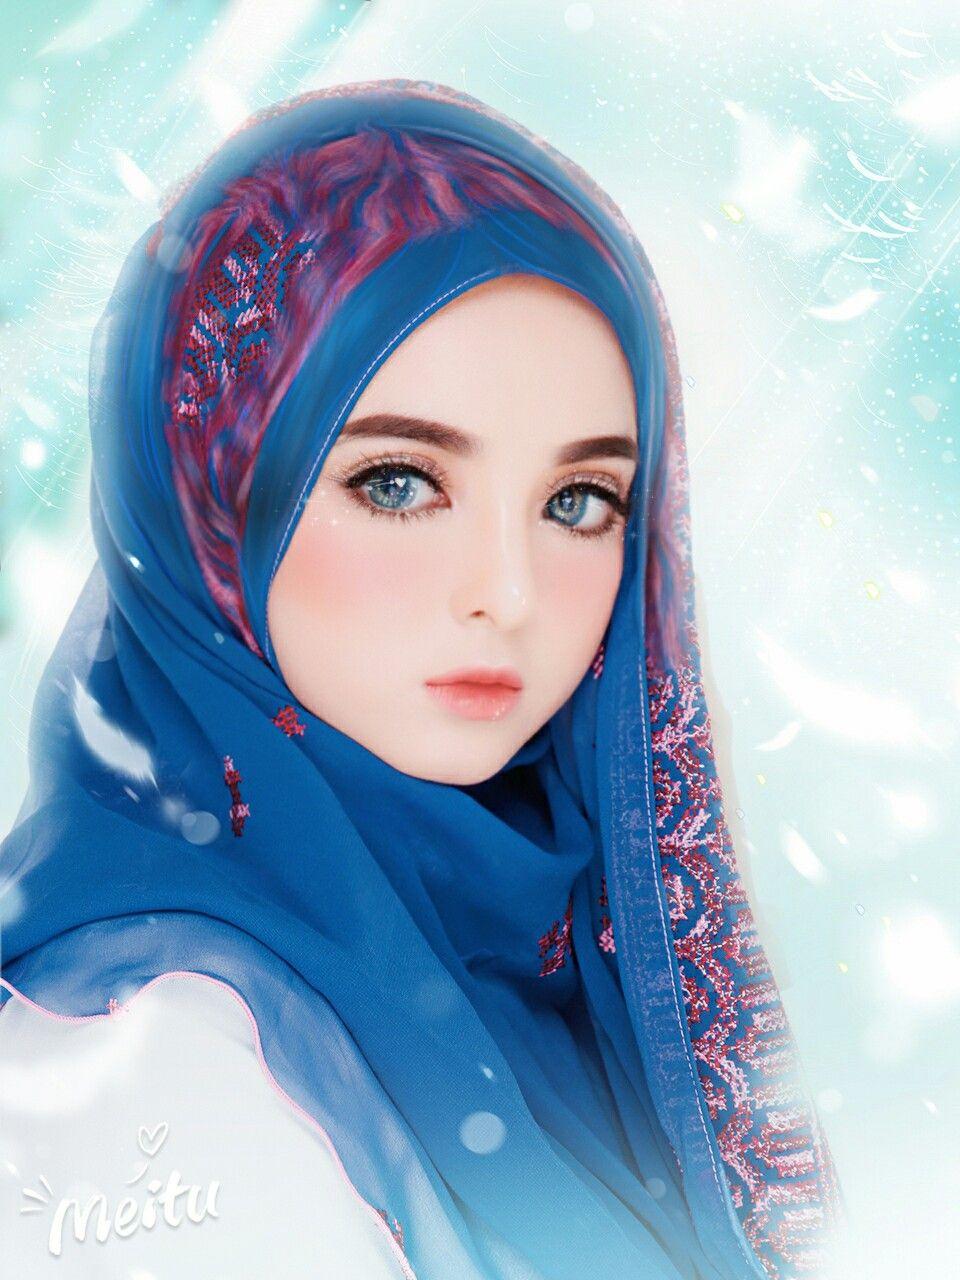 Pin oleh Sarah Eldakak di Muslim anime Lukisan wajah